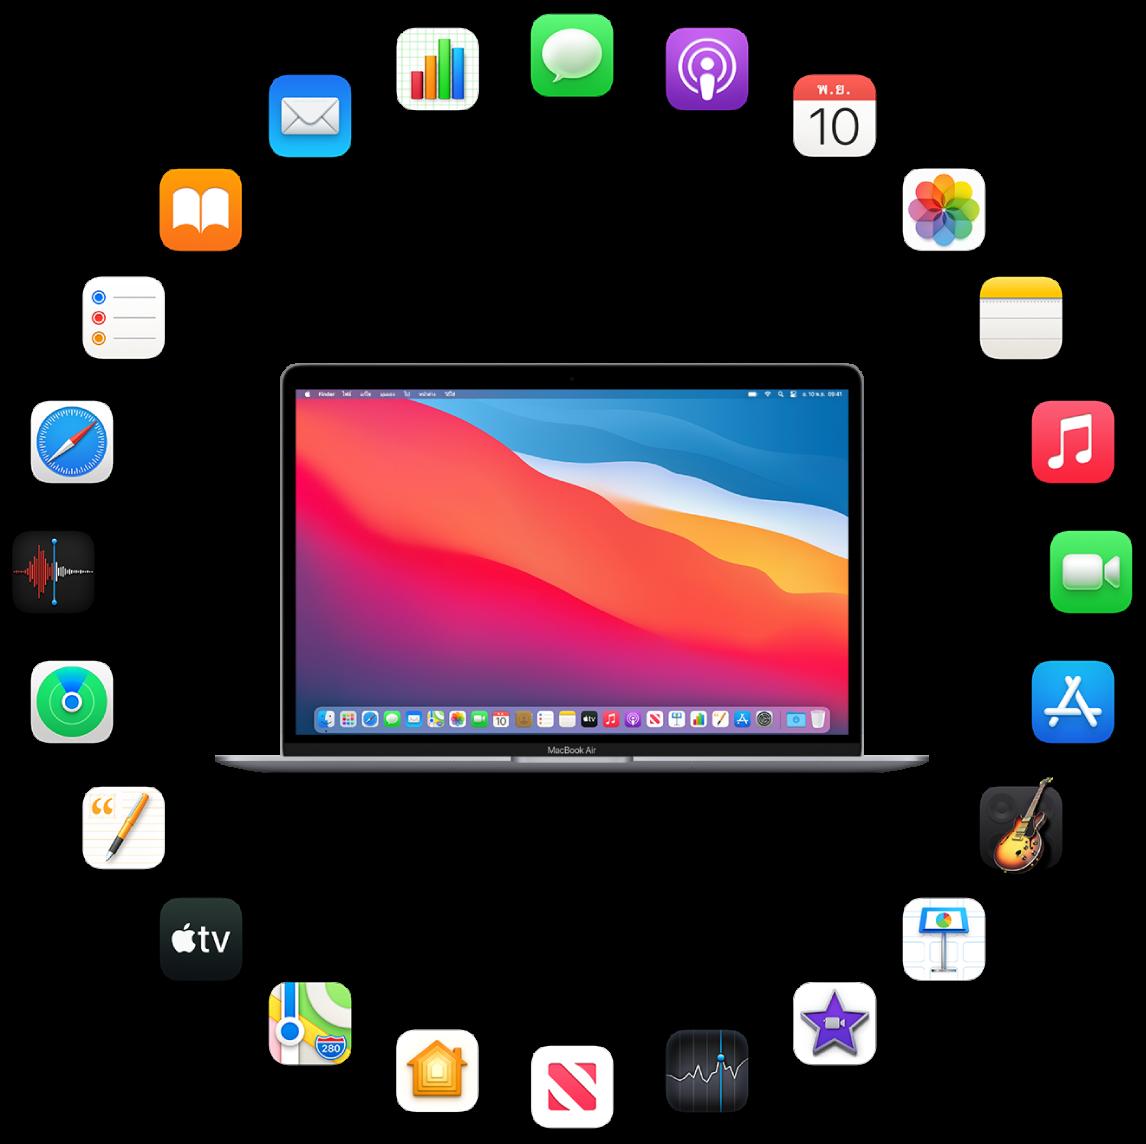 MacBookAir ที่ล้อมรอบด้วยไอคอนต่างๆ ของแอพในตัวซึ่งจะอธิบายในส่วนต่อๆ ไป